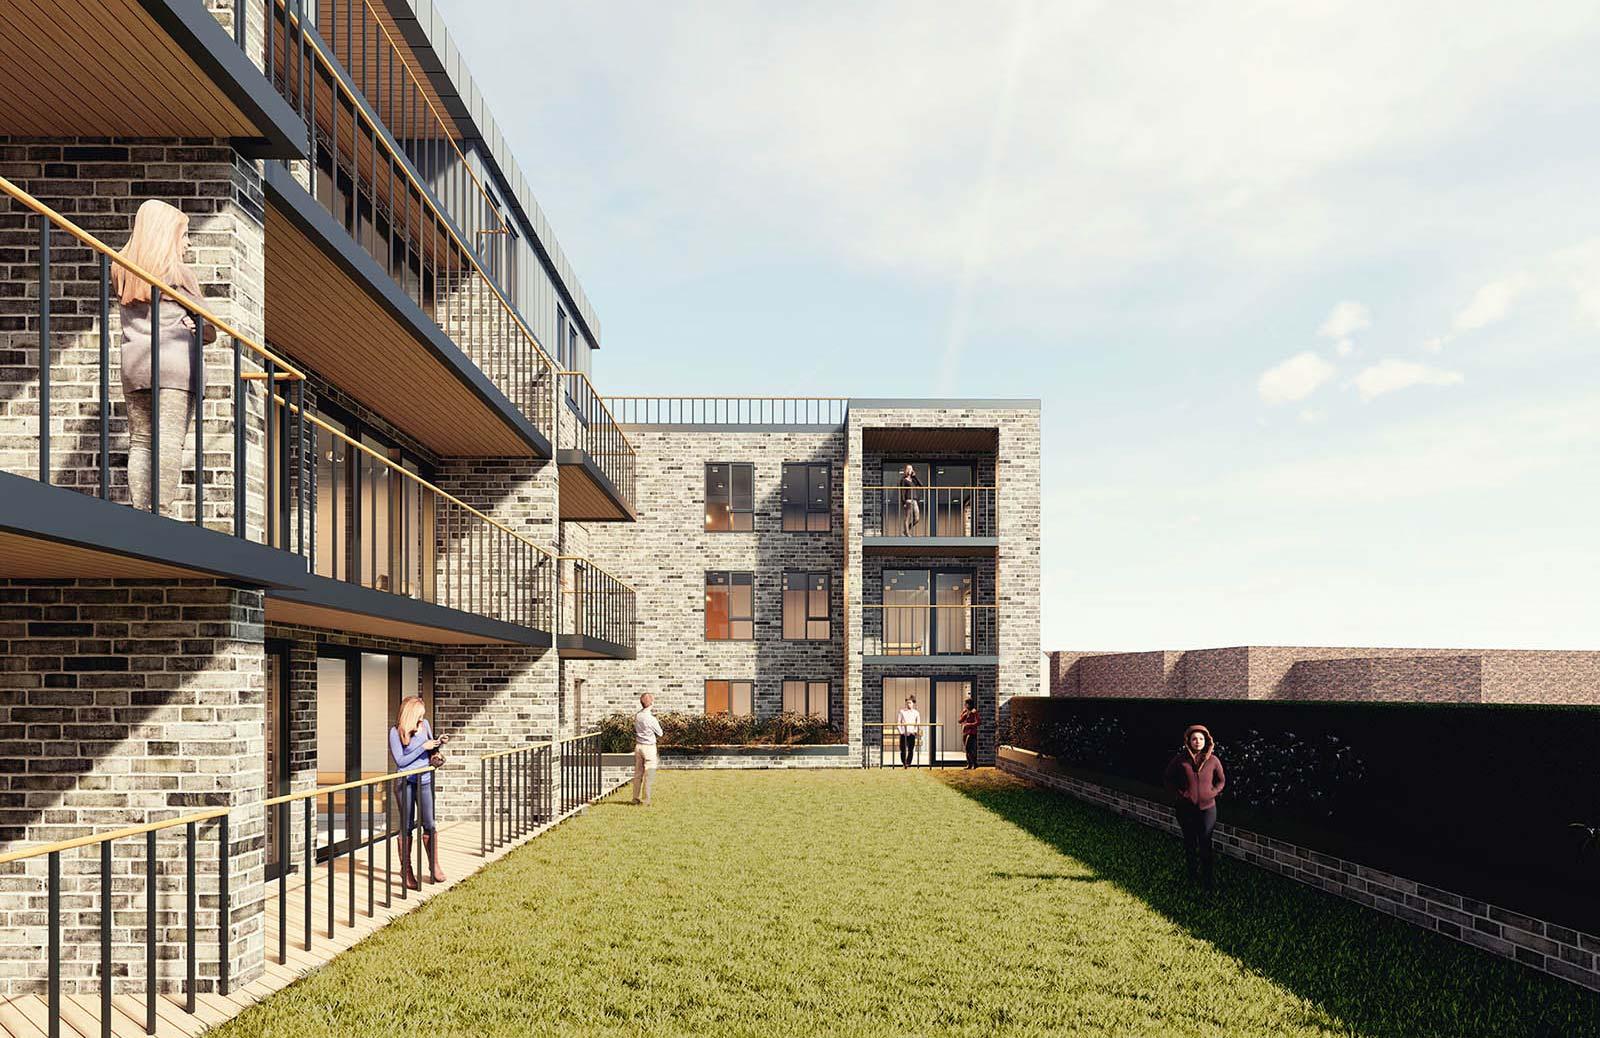 walton on thames town centre apartments